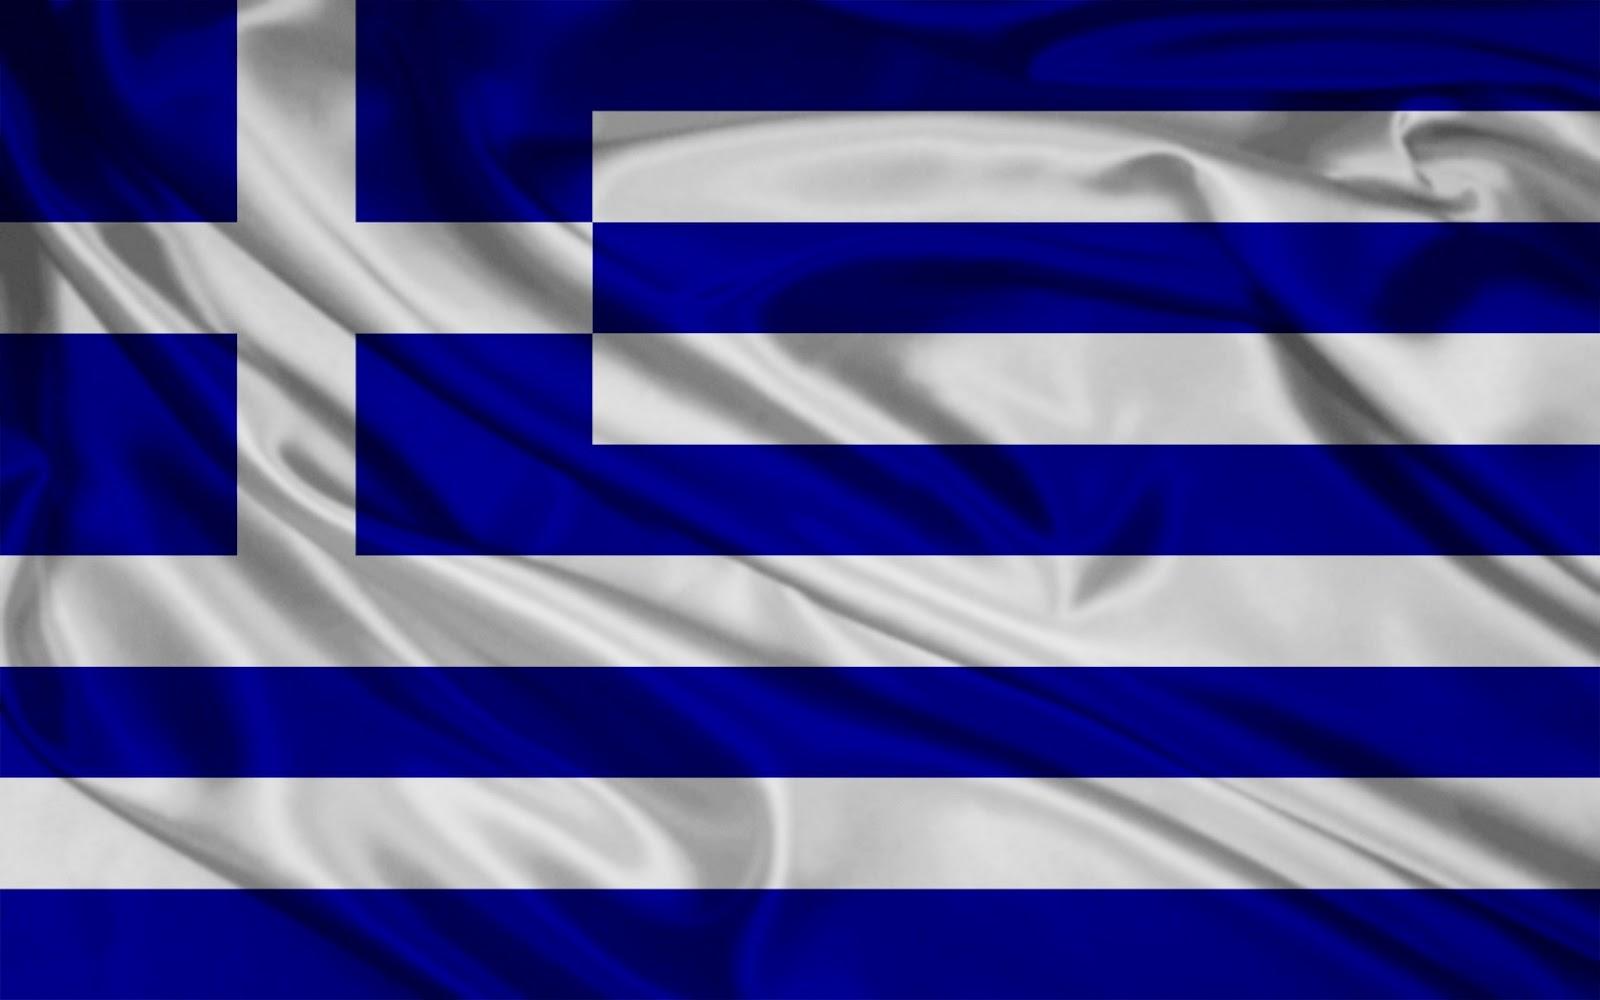 greece-flag-wallpapers-1680x1050.jpg